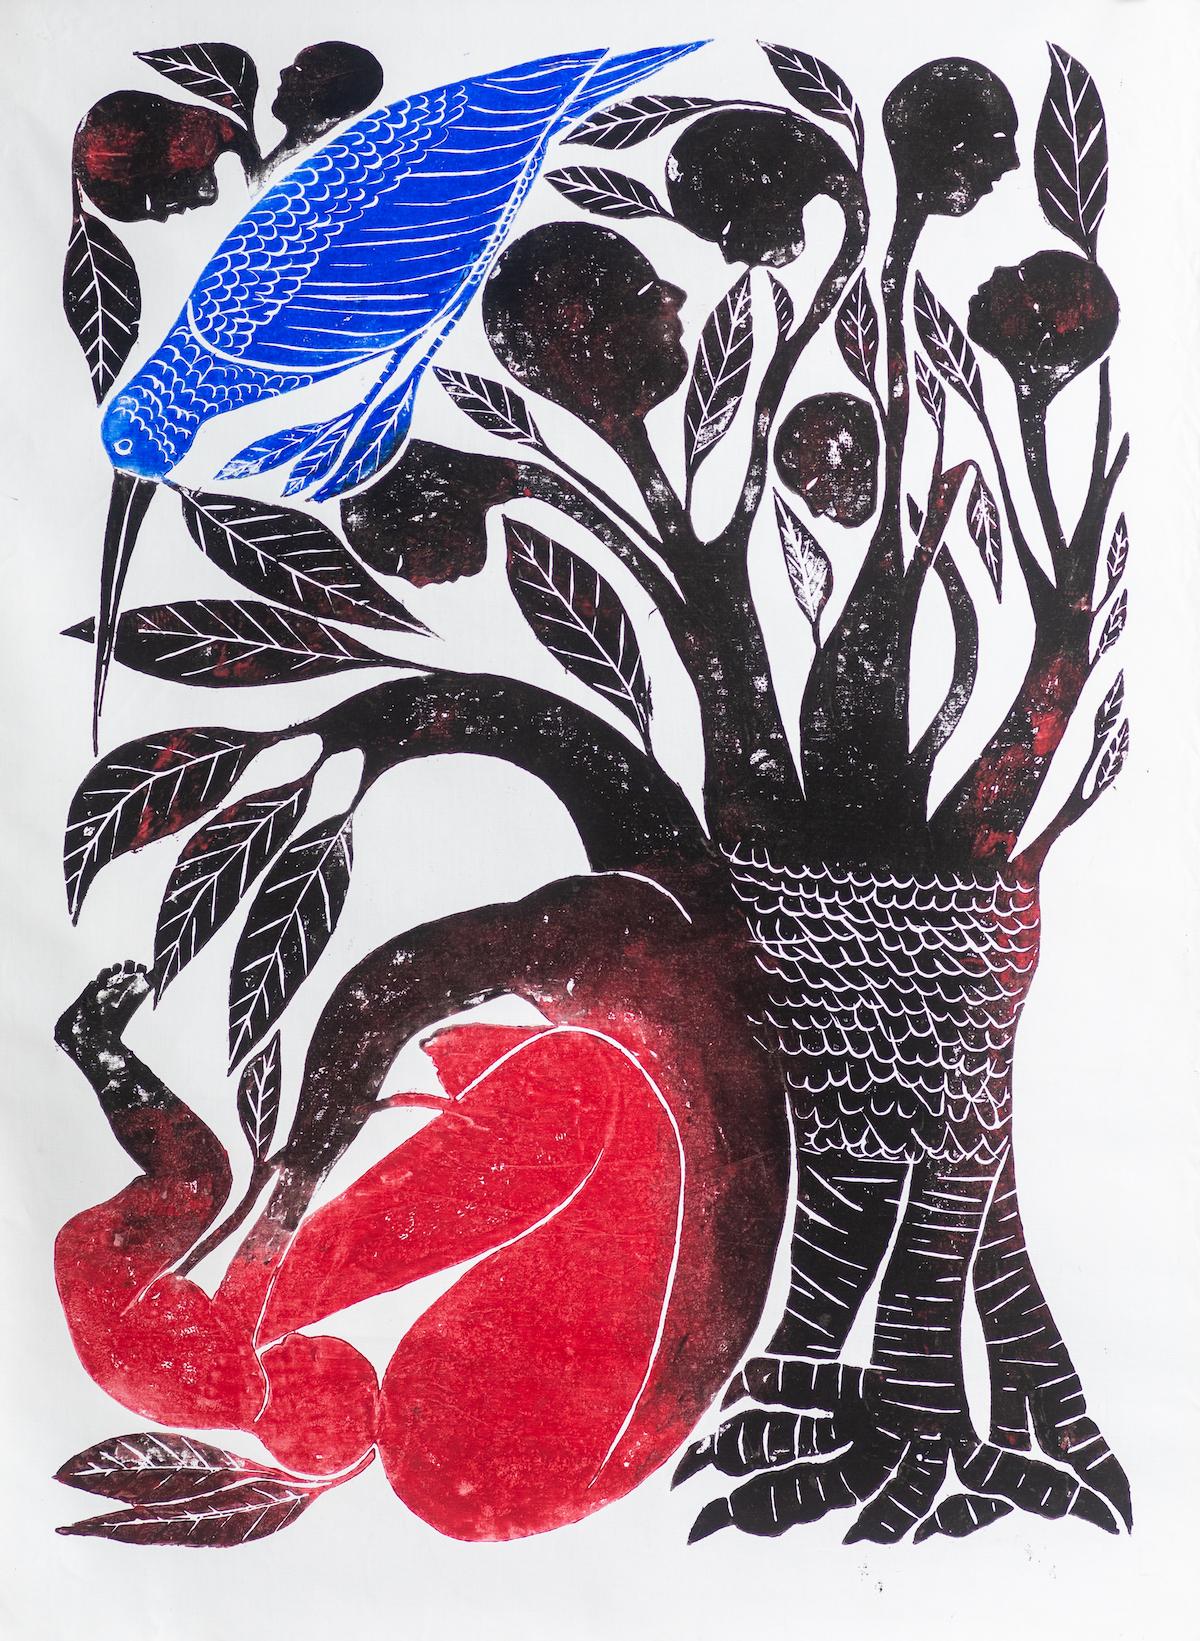 Le chant du colibri, Jems Koko Bi, 2020. Courtesy The artist & Gallery Cecile Fakhoury